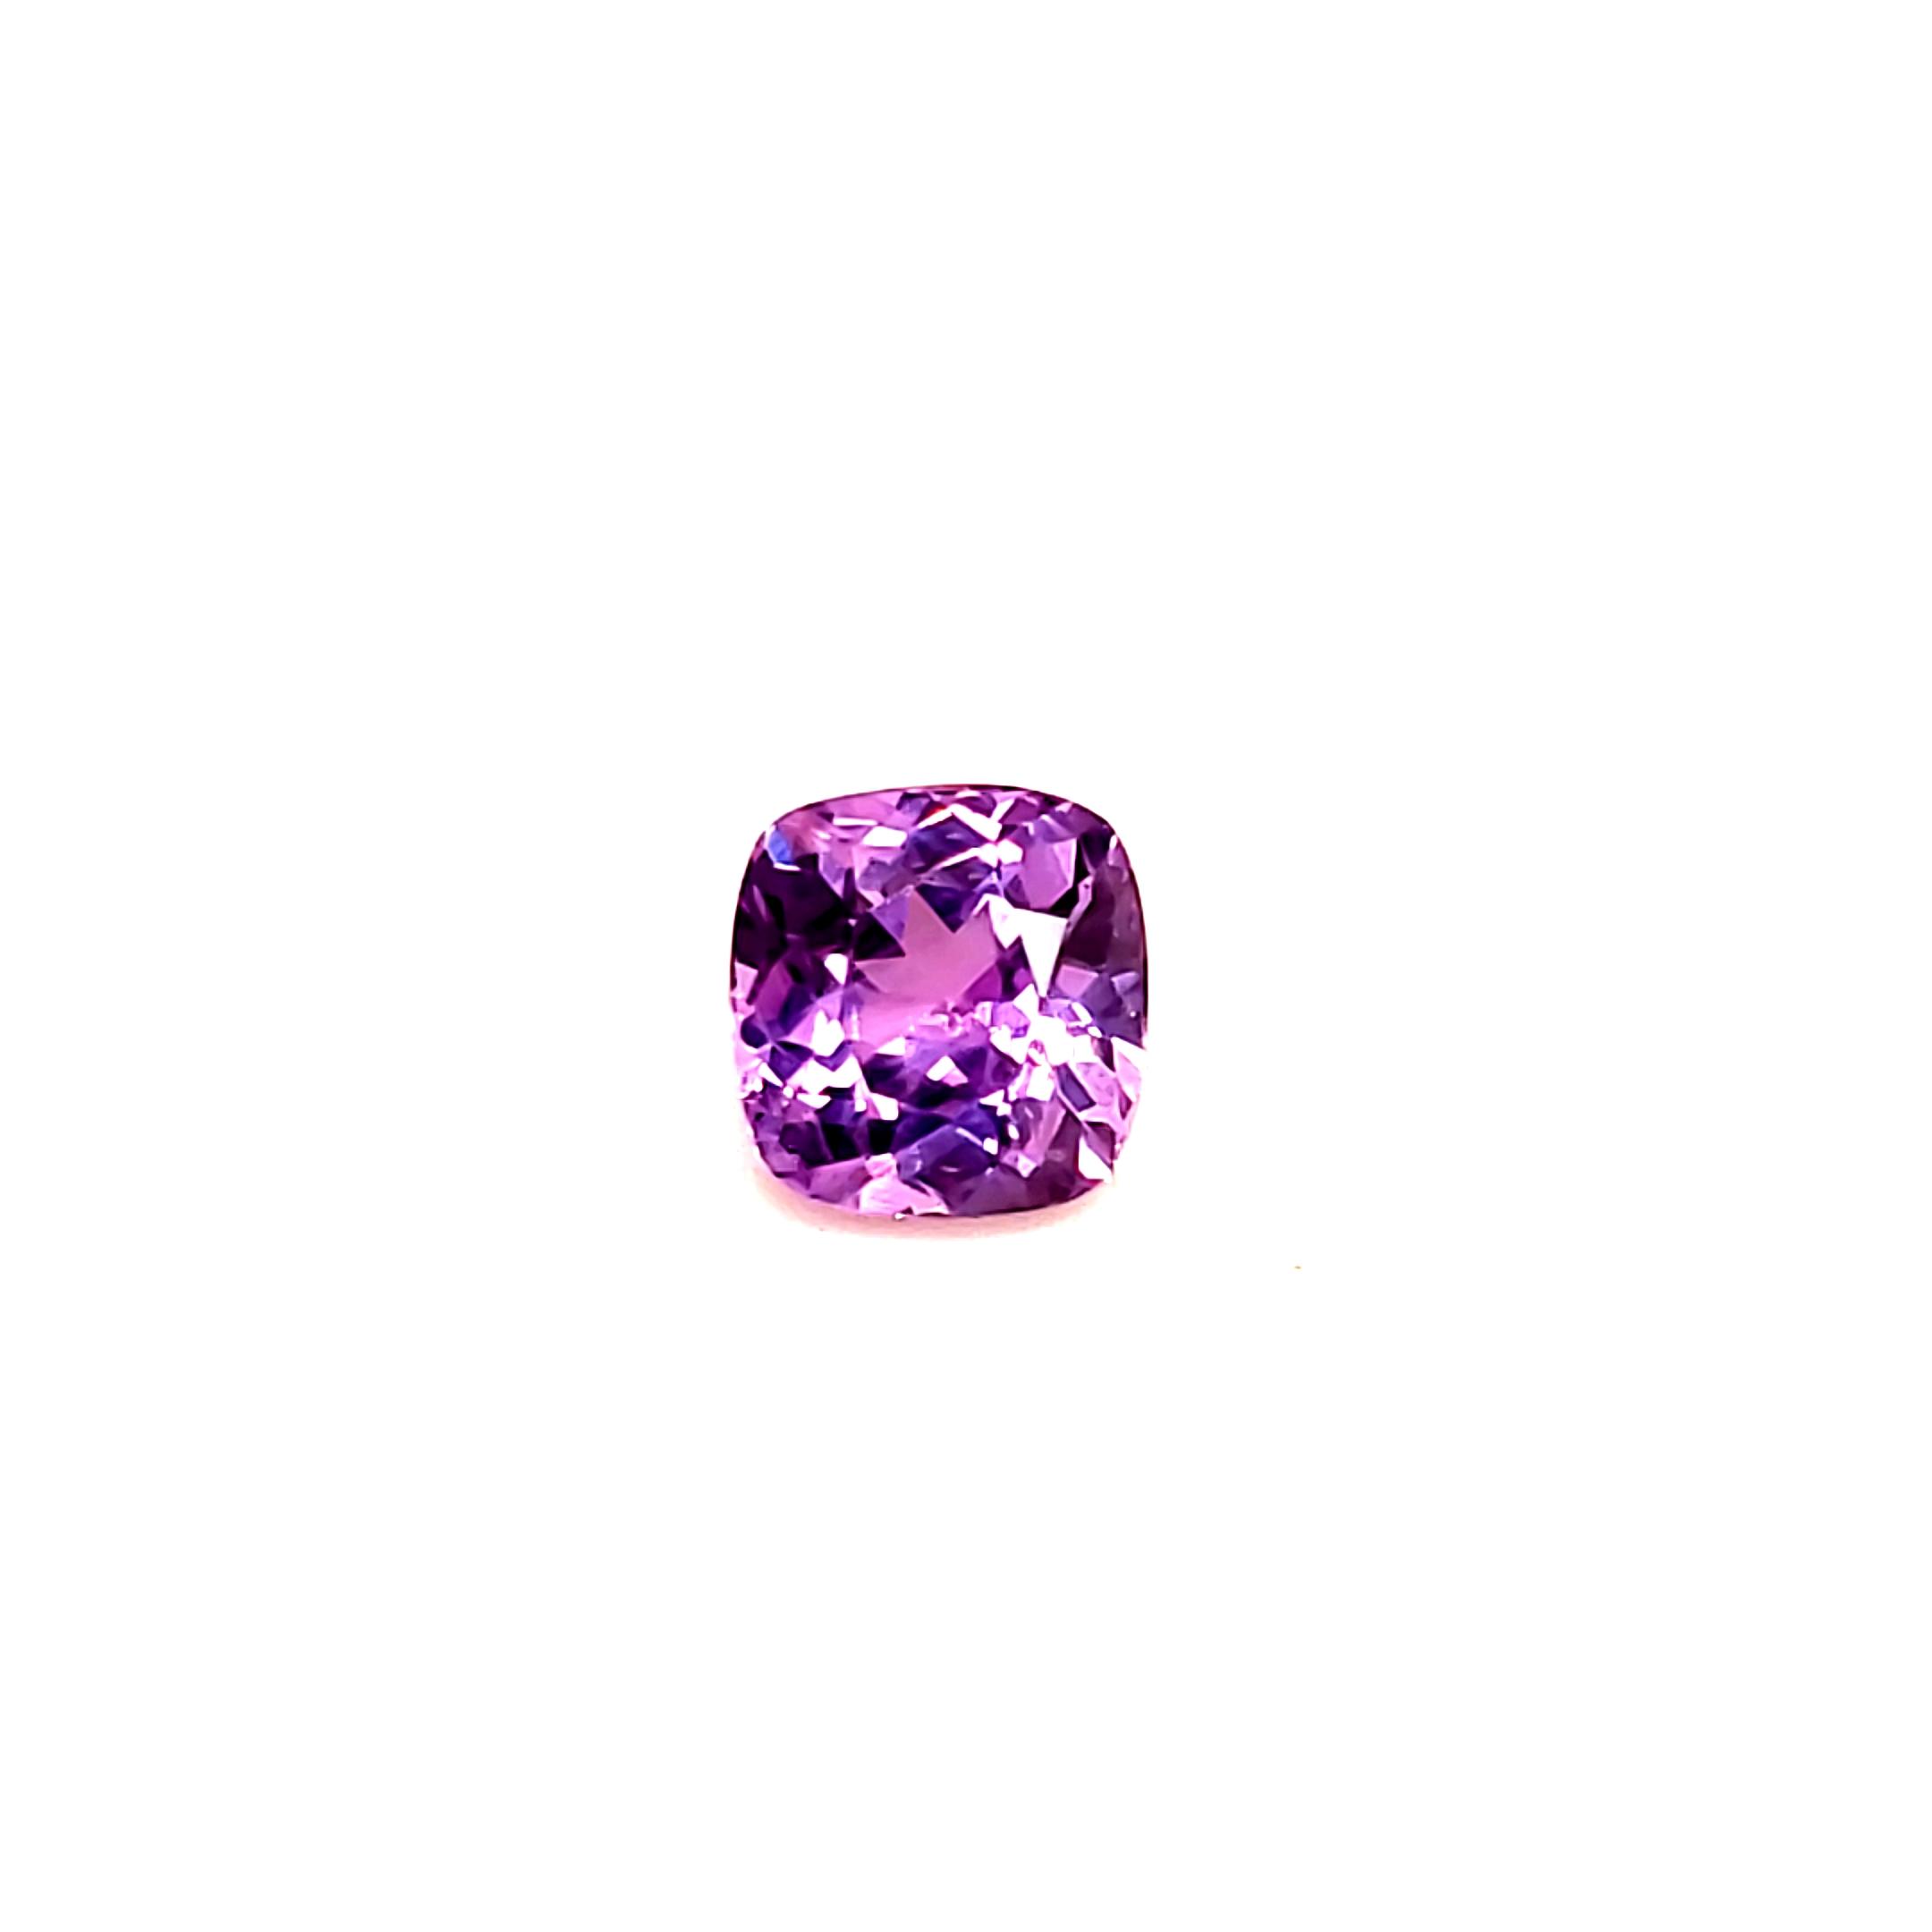 1.93 ct. pinkish Lavendar